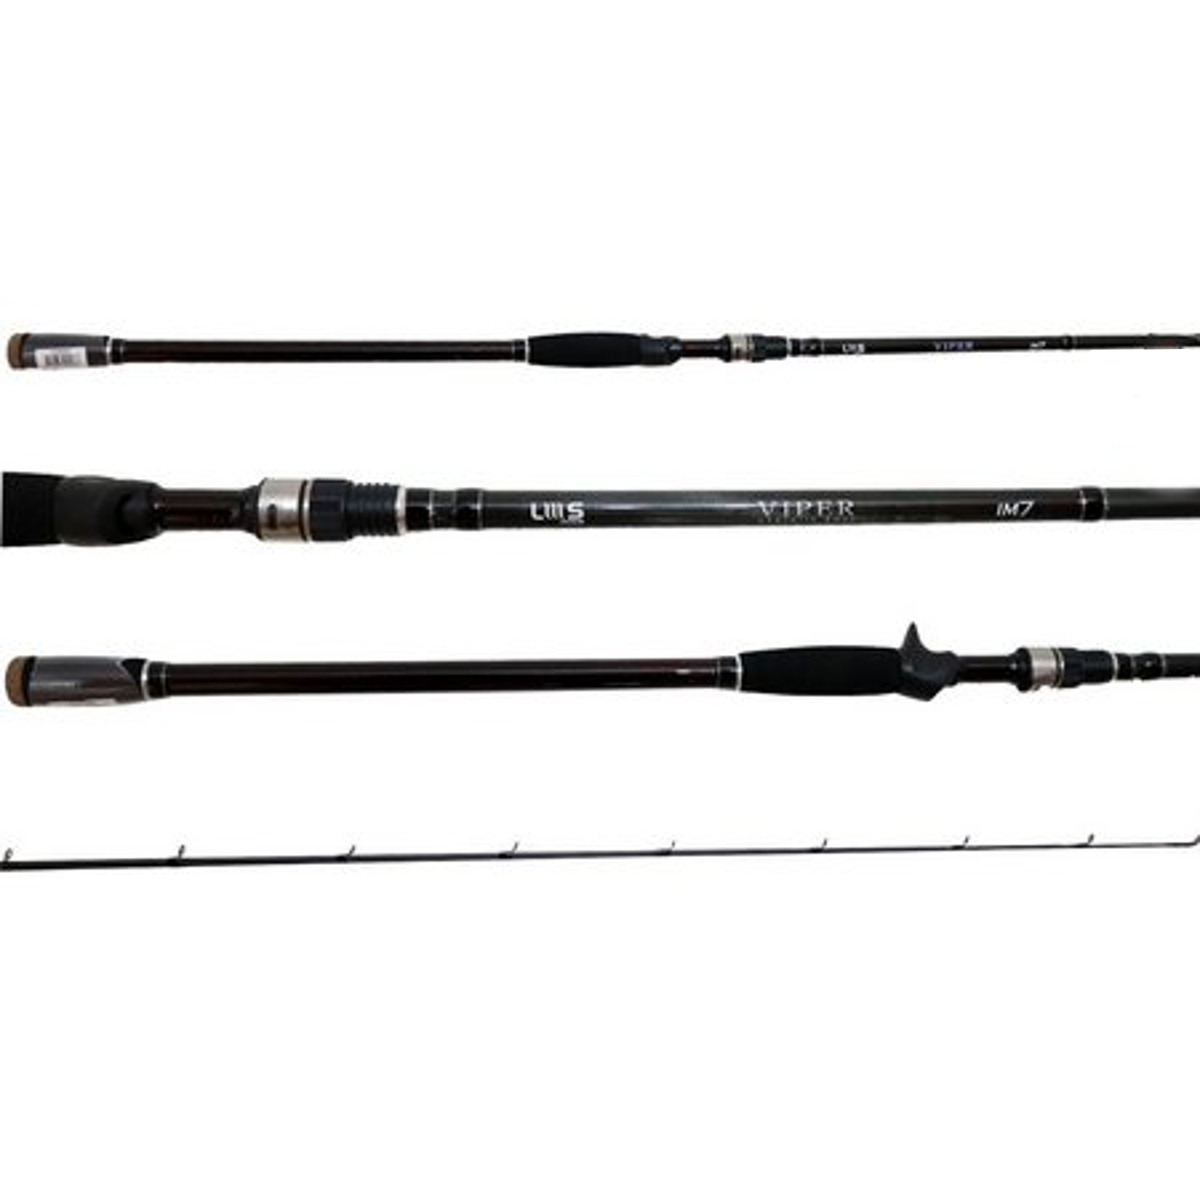 Vara Lumis Viper 762 (2,28m) 15-40lb Carretilha 2 Partes  - Pesca Adventure